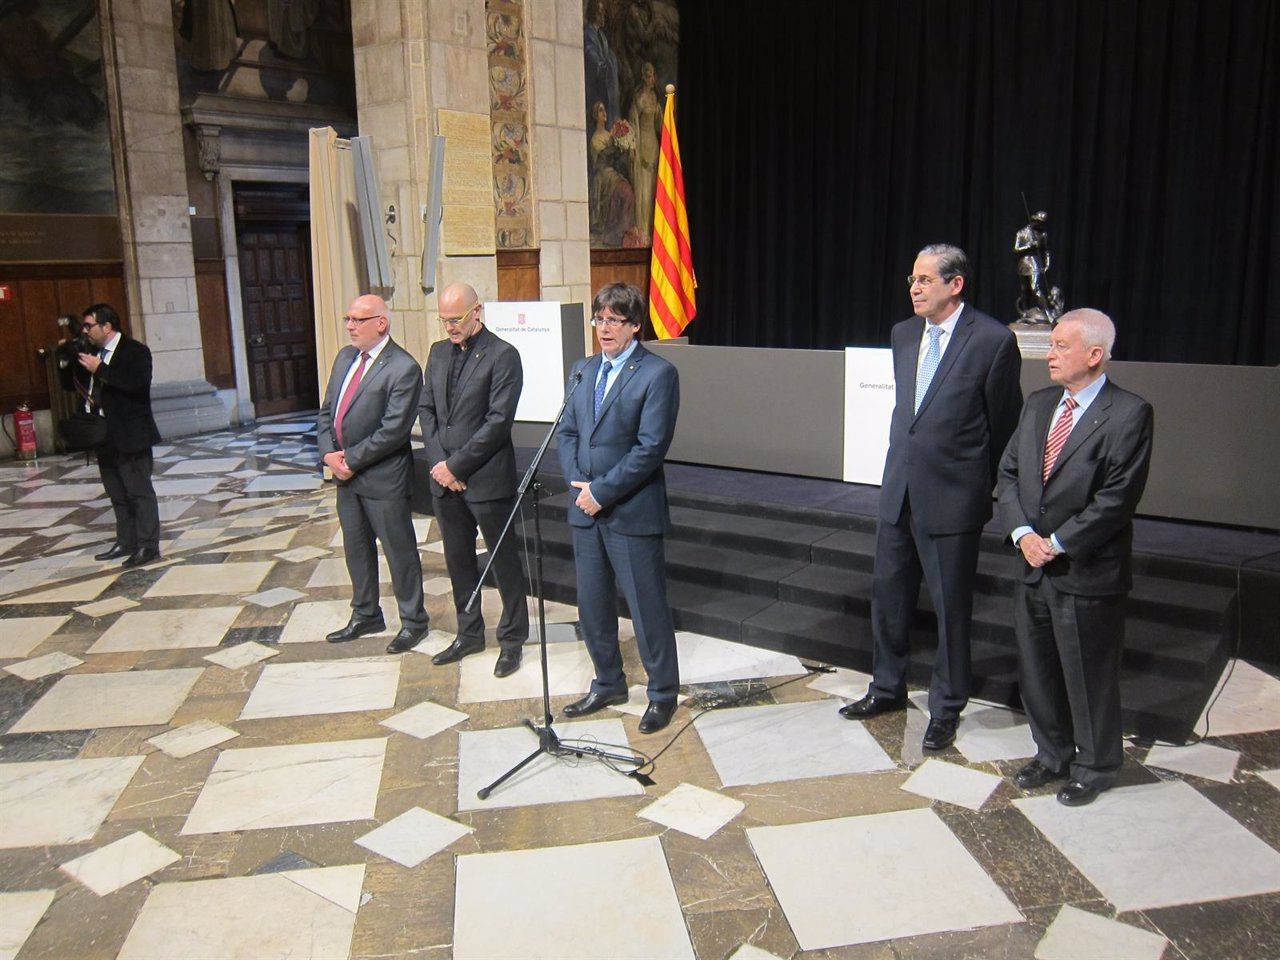 J.Baiget, R.Romeva, C.Puigdemont y el cónsul J.A.Buffa